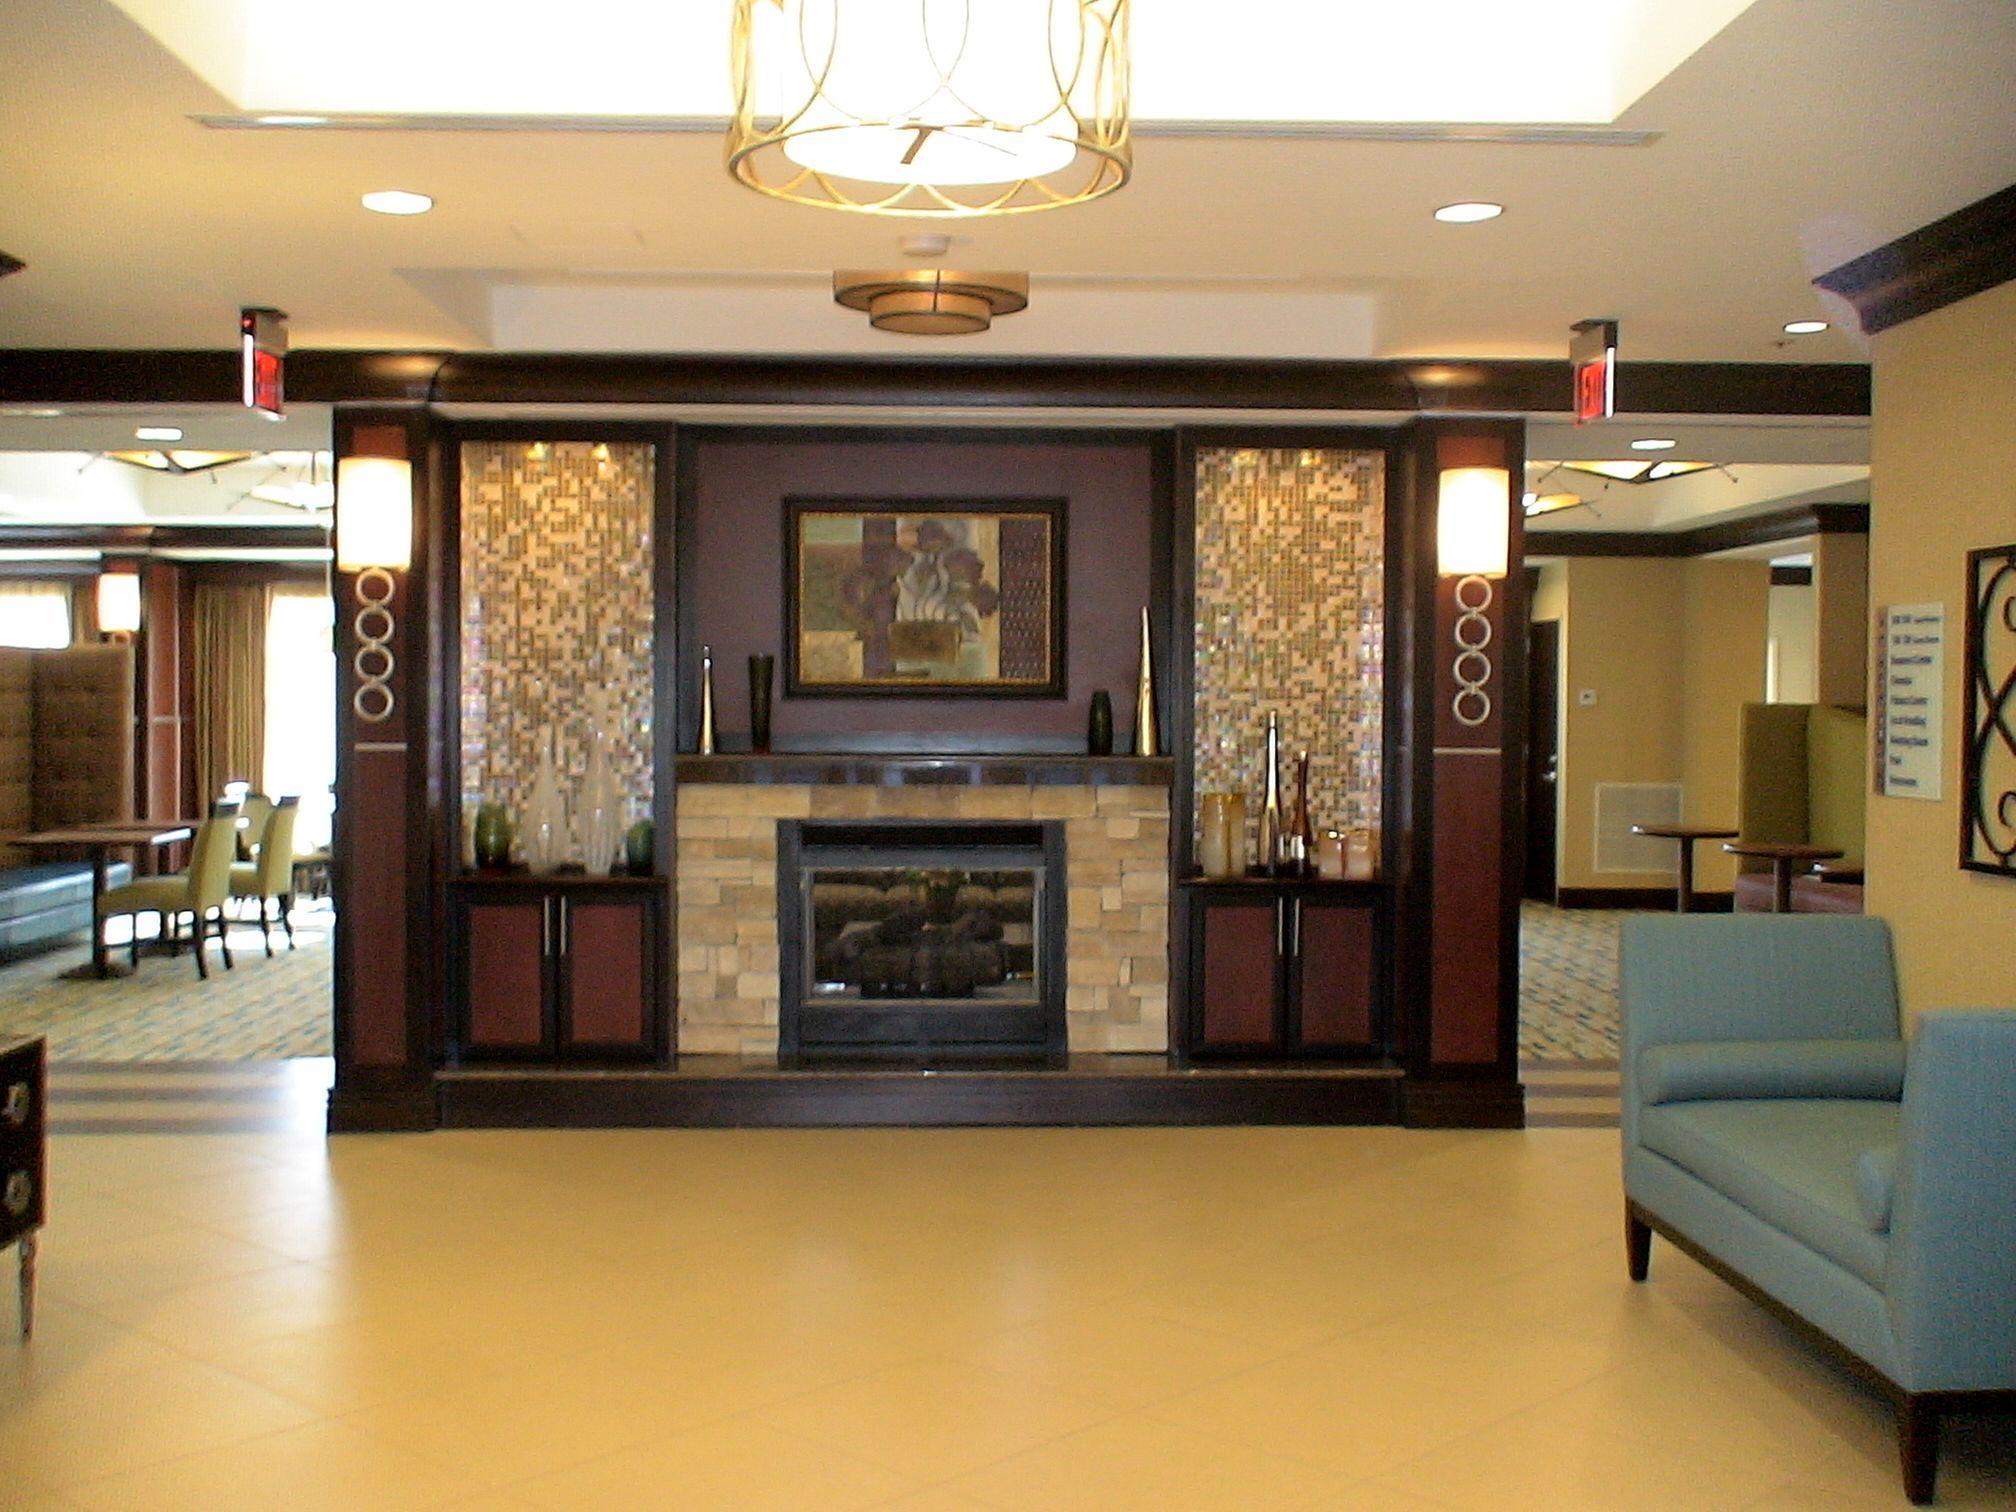 Hotel & Apartment Lobby Interior Design in NYC | Jonathan Baron ...